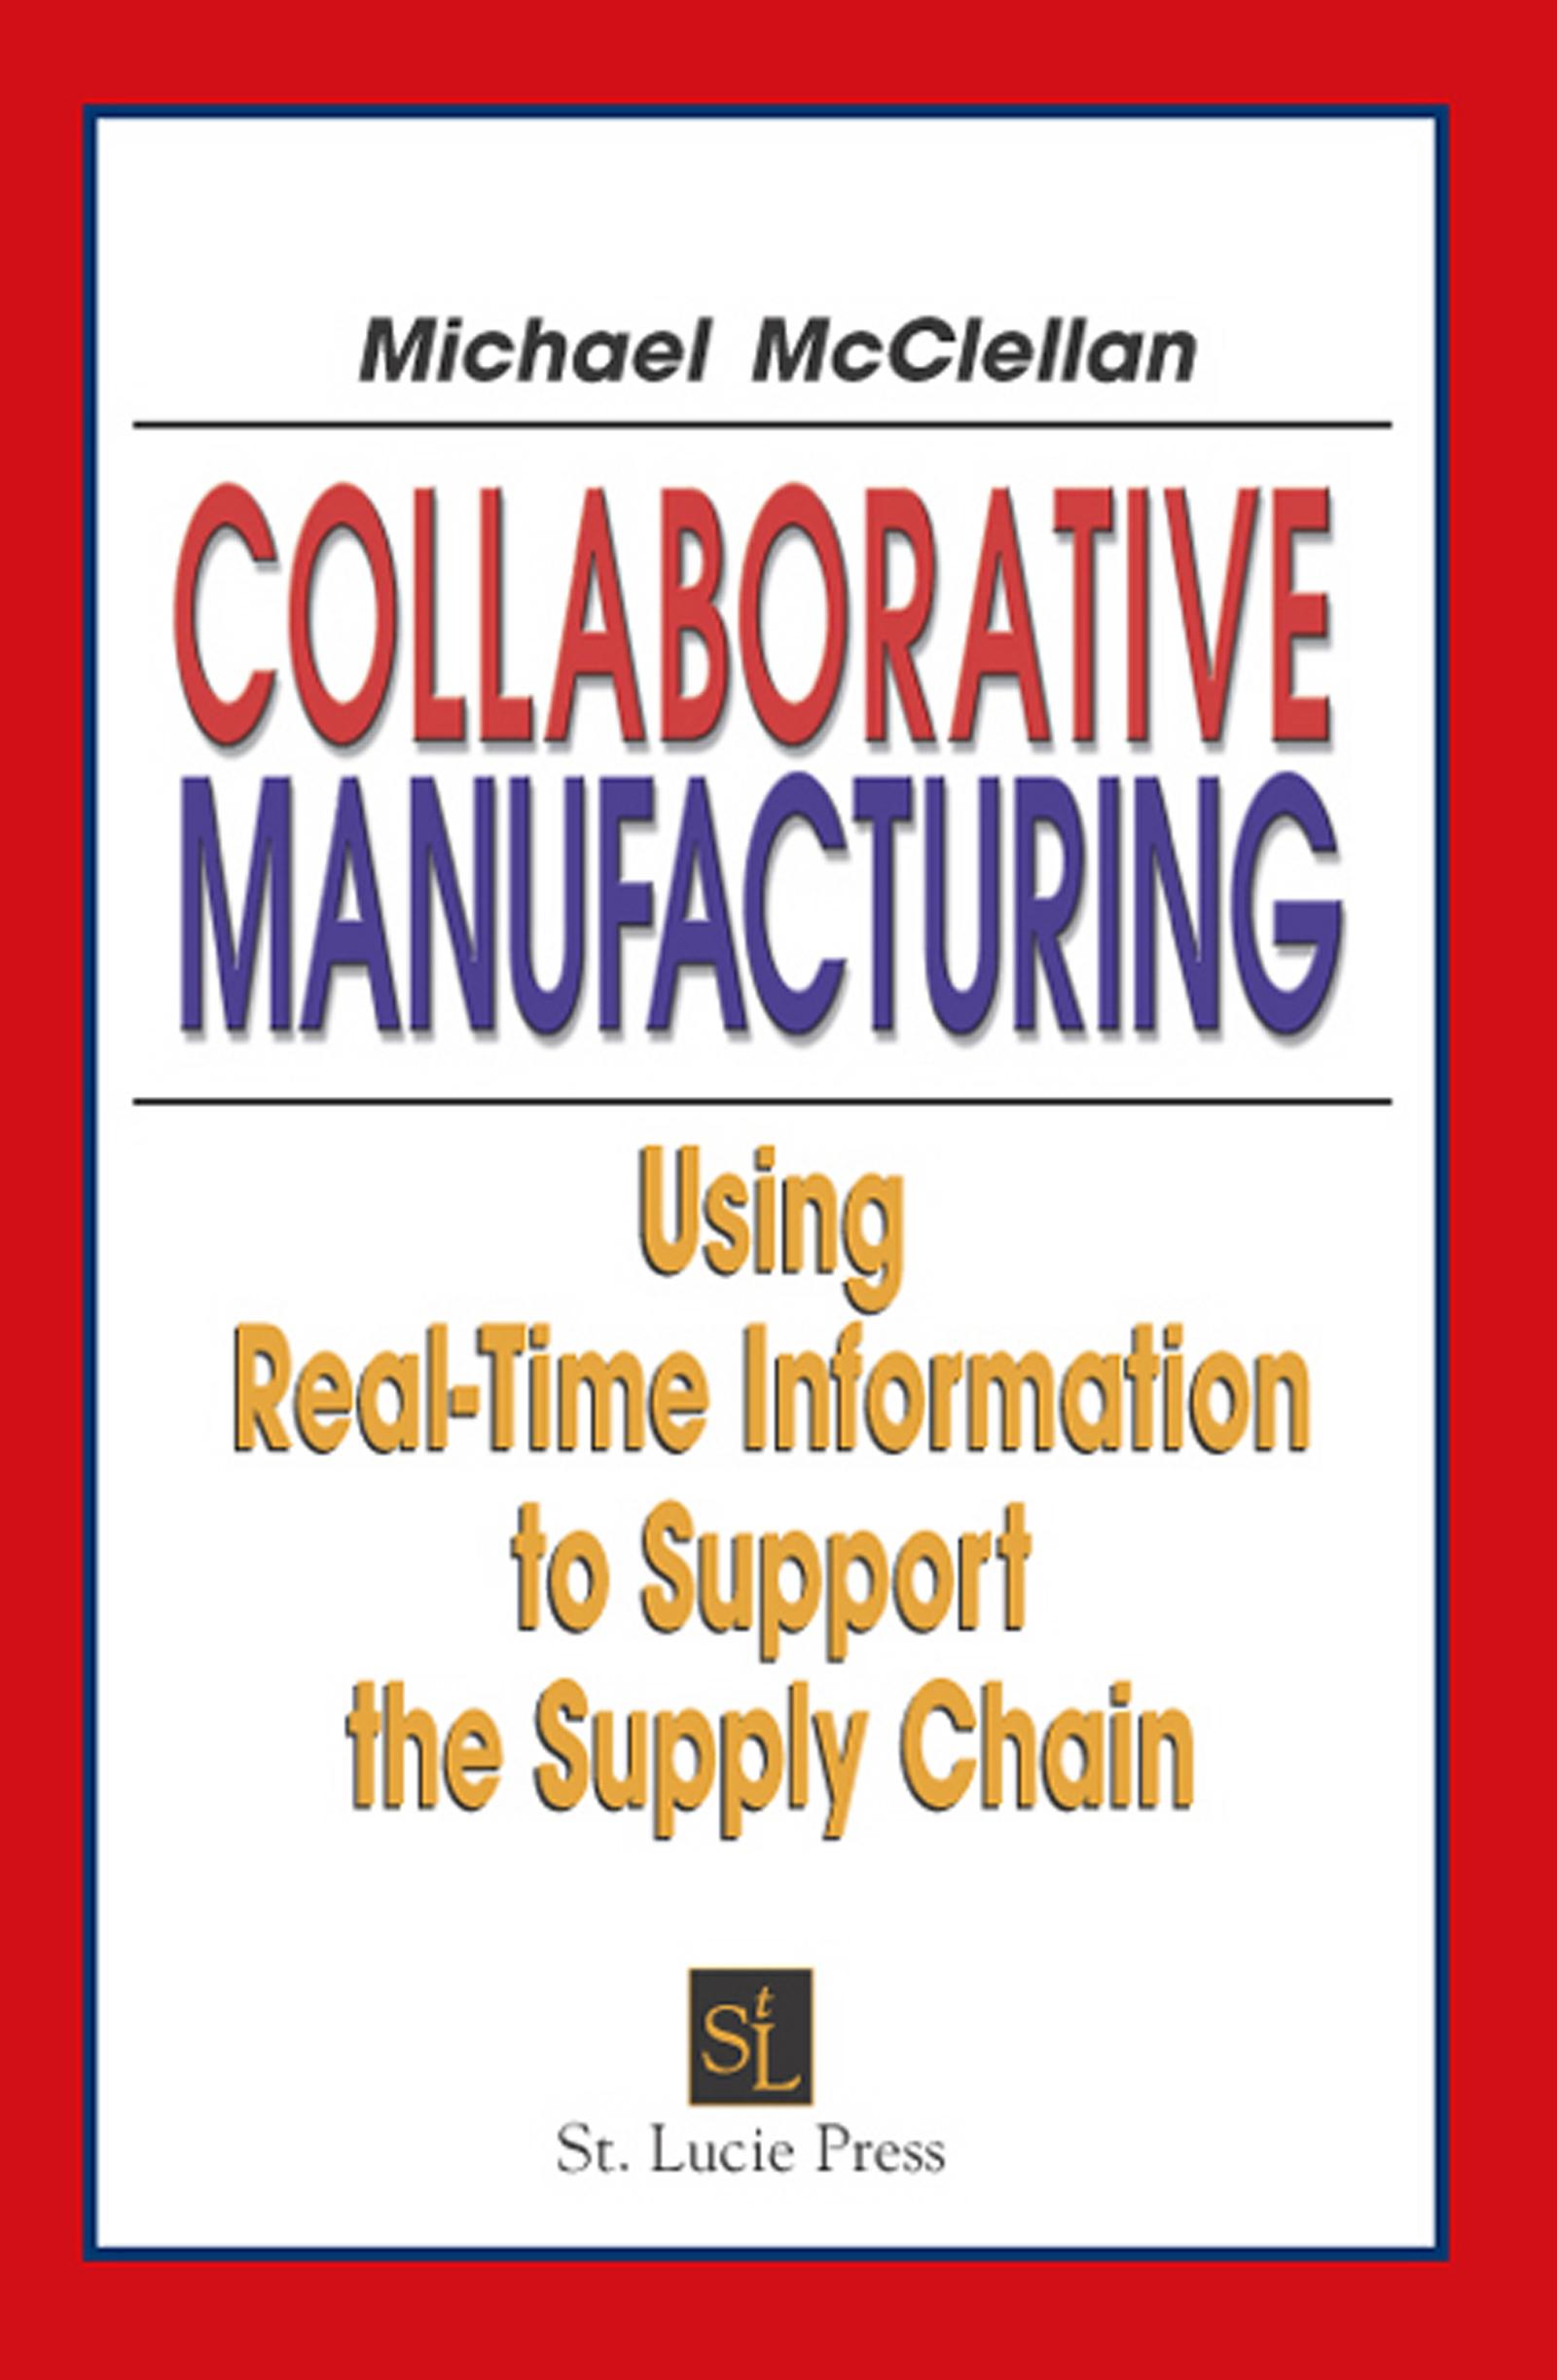 Download Ebook Collaborative Manufacturing by Michael McClellan Pdf